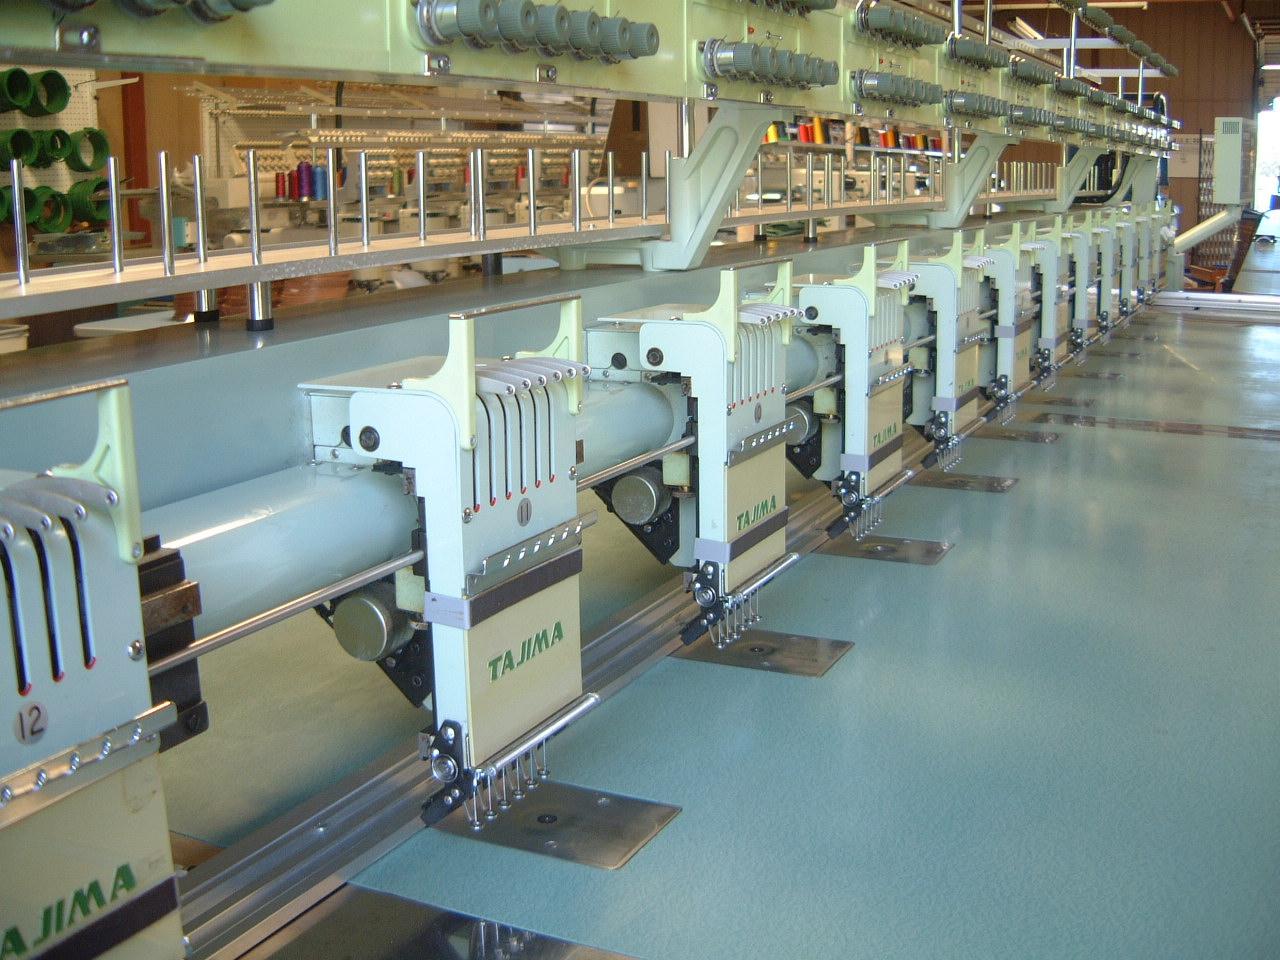 620 embroidery machine